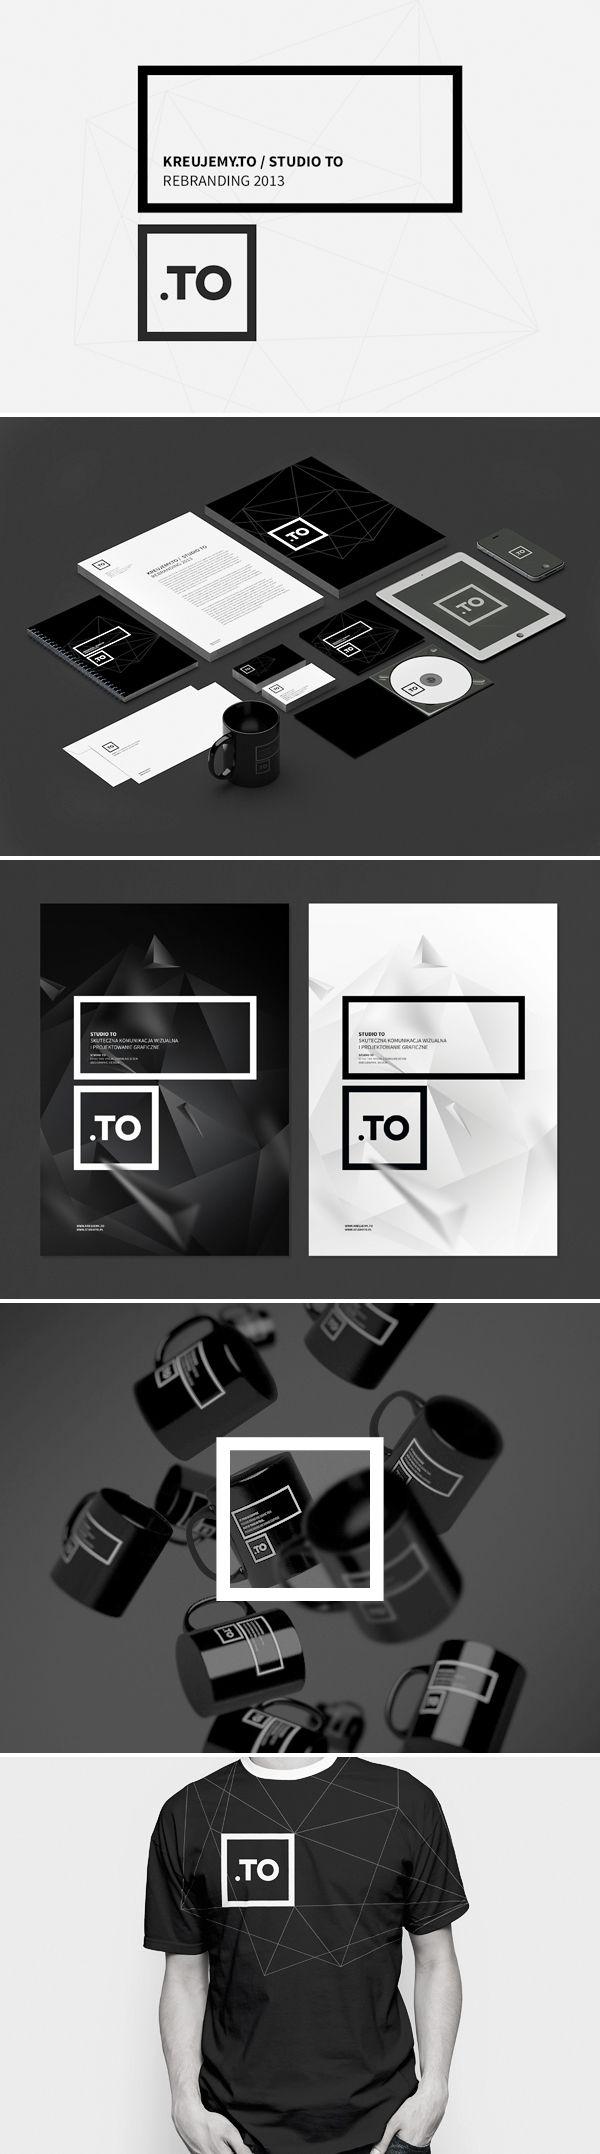 // | #stationary #corporate #design #corporatedesign #identity #branding #marketing < repinned by www.BlickeDeeler.de | Take a look at www.LogoGestaltung-Hamburg.de